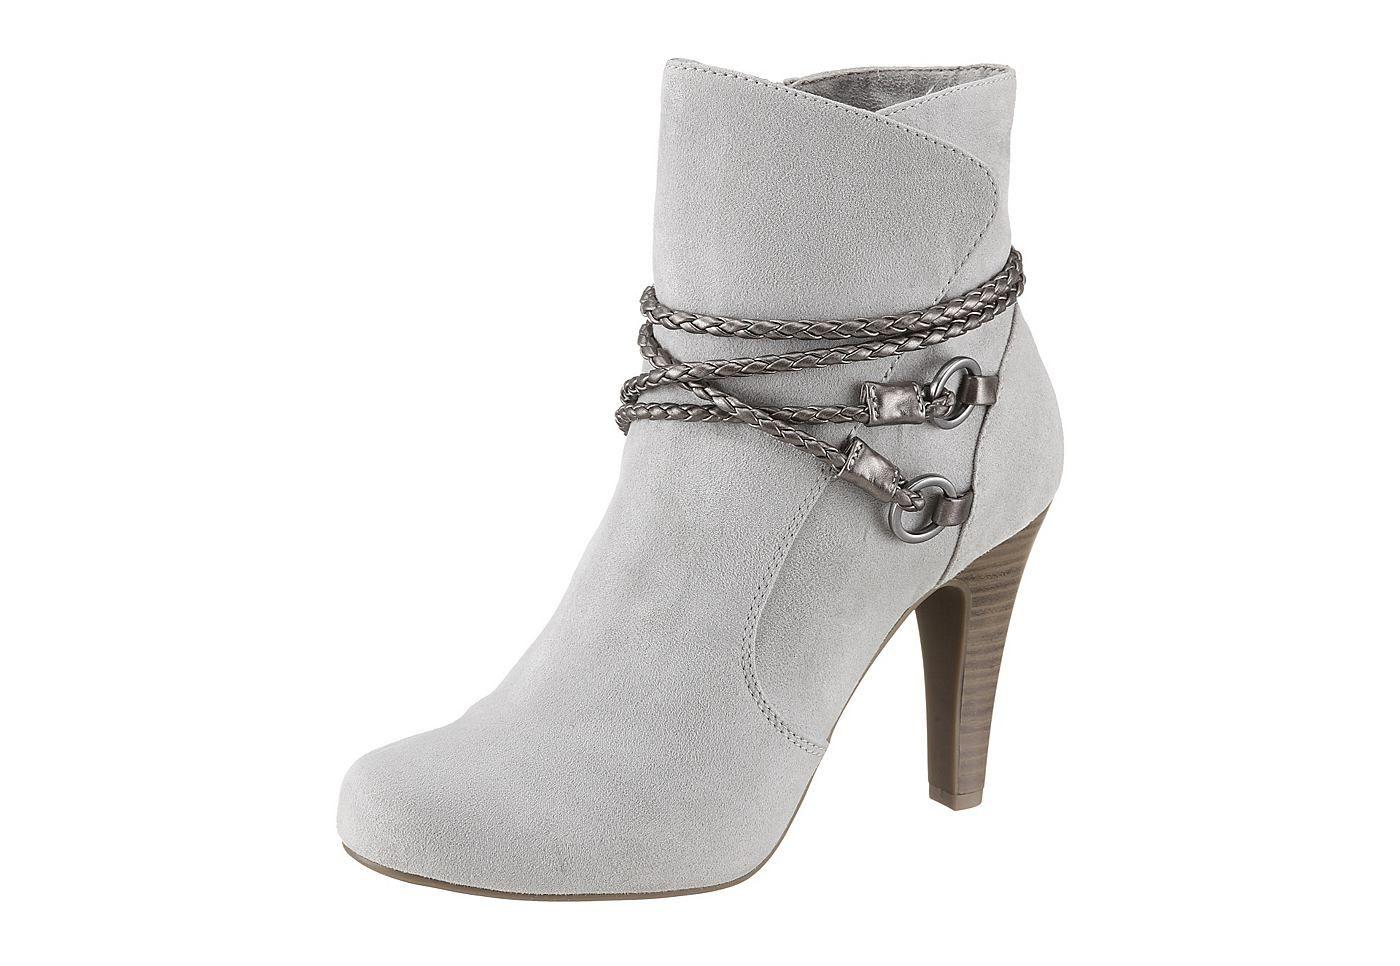 High Heel Stiefelette, Tamaris. Textil in Velourslederoptik